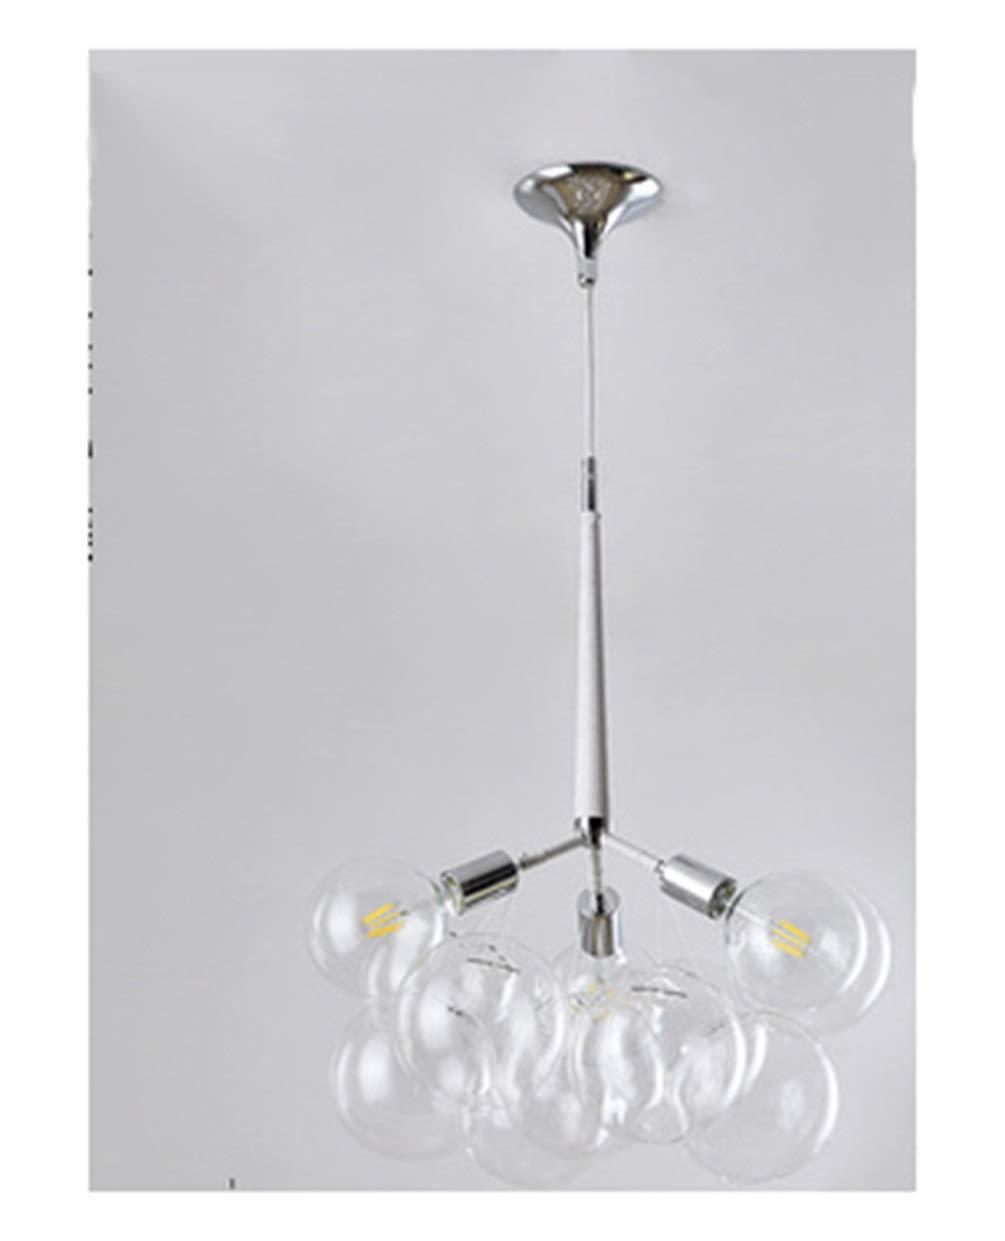 B.YDCM Sputnikシャンデリア - シンプルファッションバブルボールシャンデリア寝室レストランリビングルーム人格ガラスバブルライト - ペンダントライト B07TTFT78W